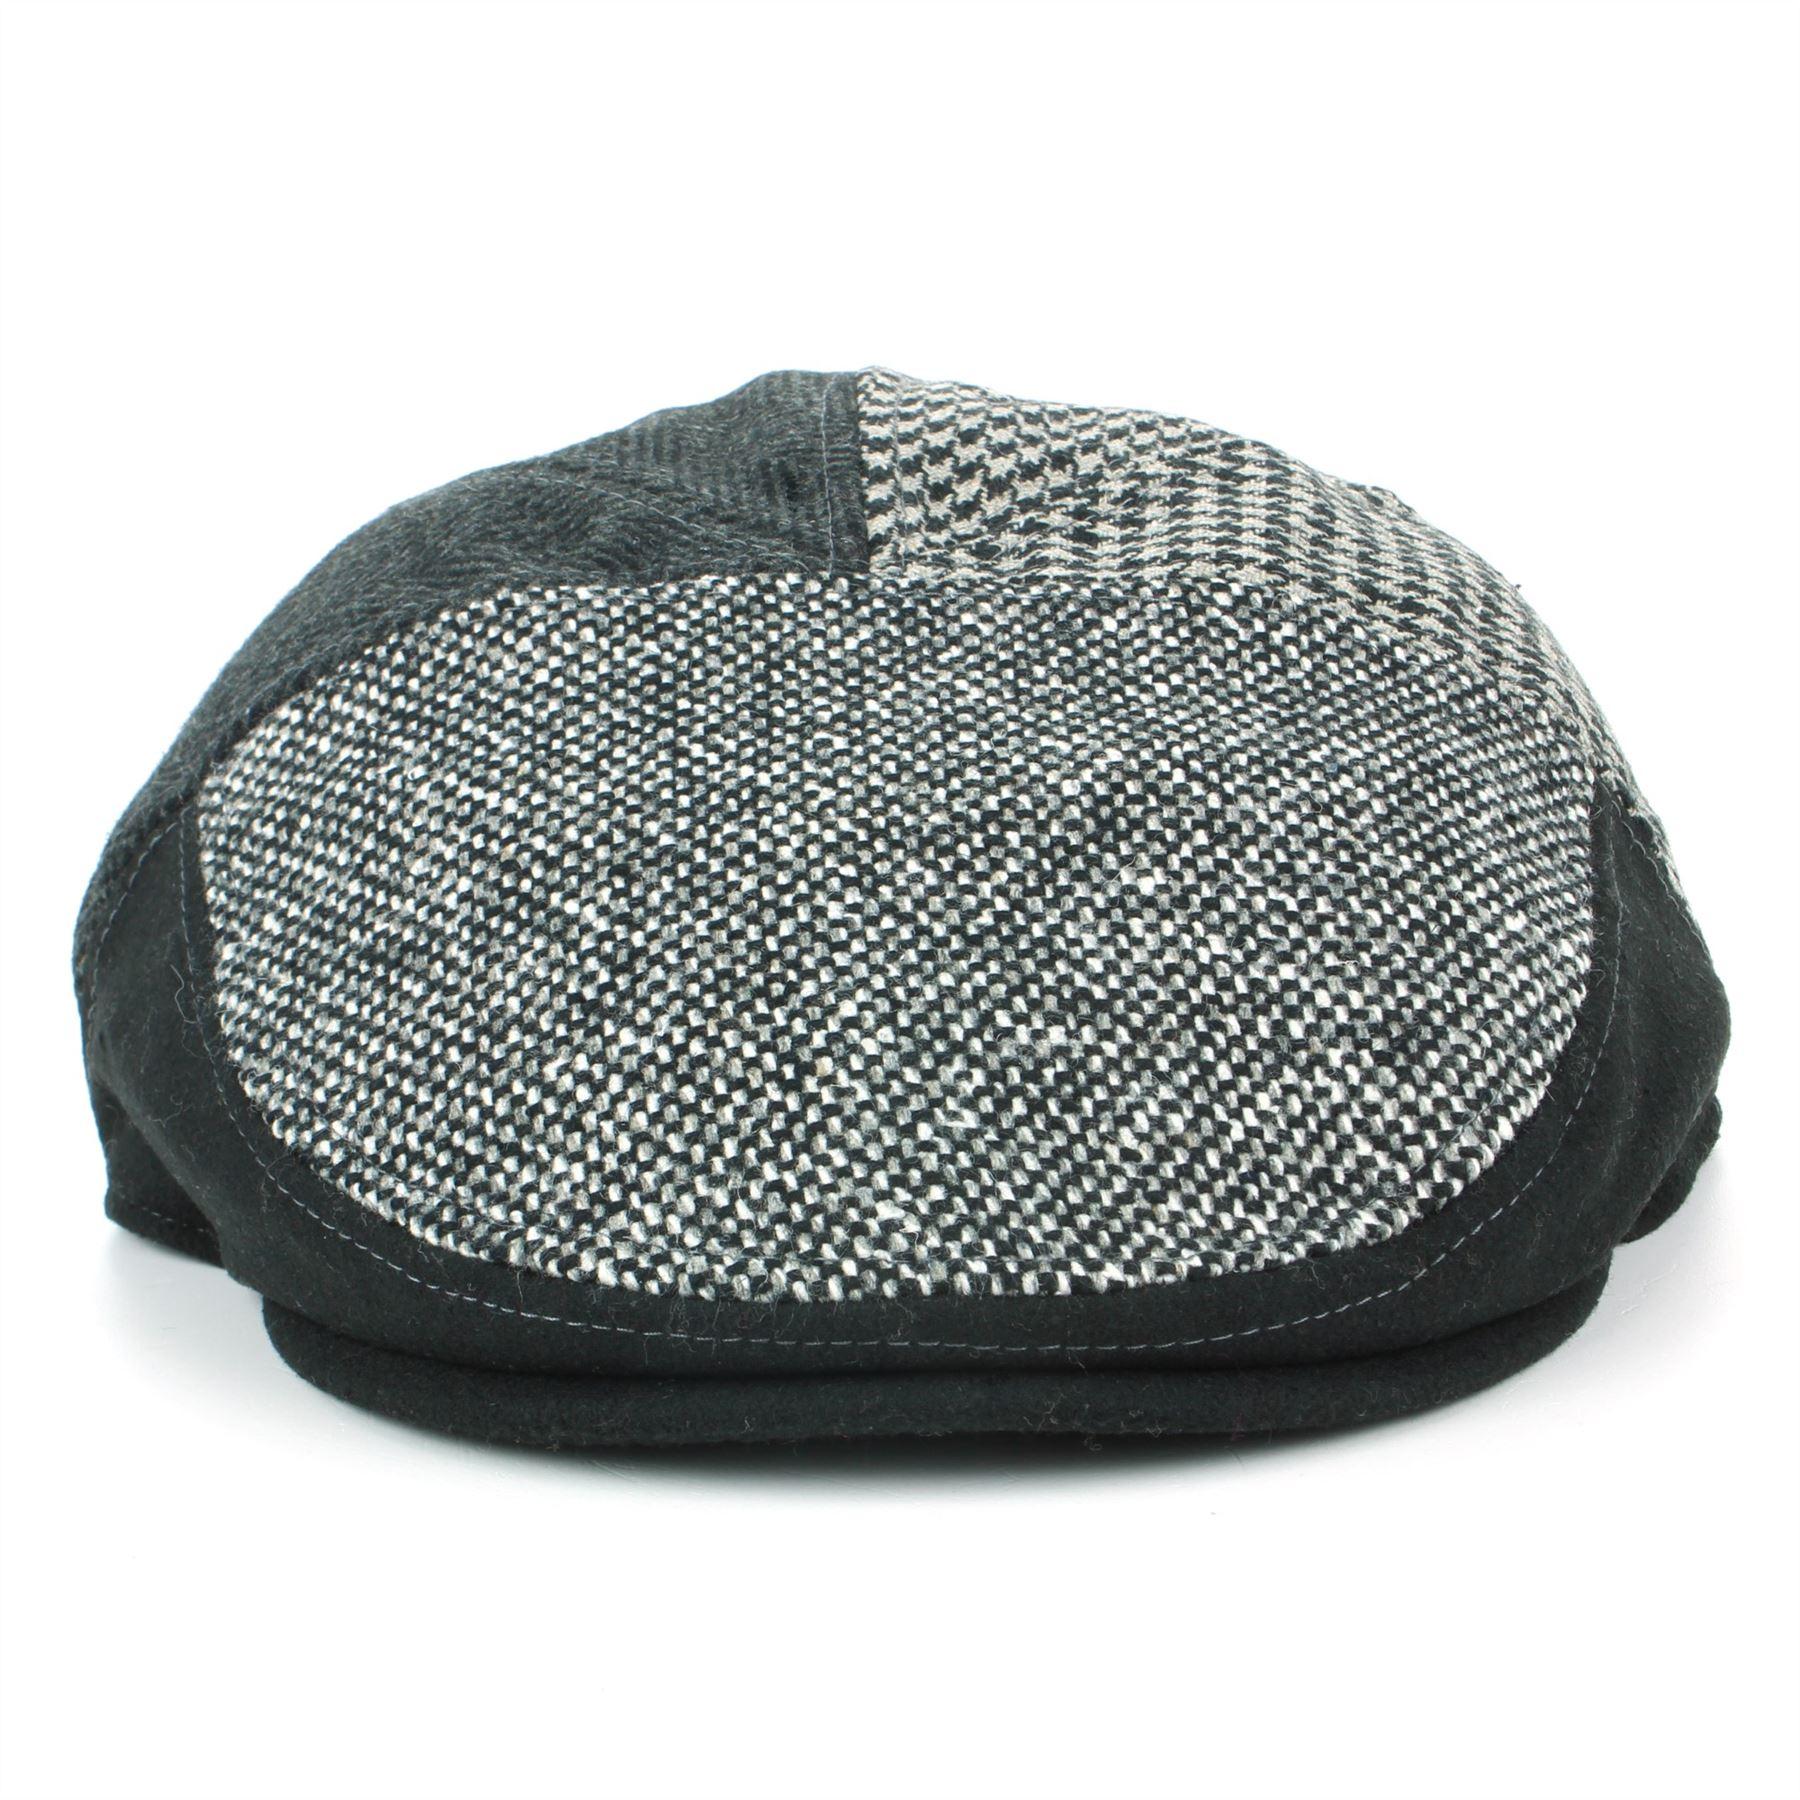 Tweed Flat Cap Hat bleu vert laine Hawkins Panneau tissu patchwork Herringbone